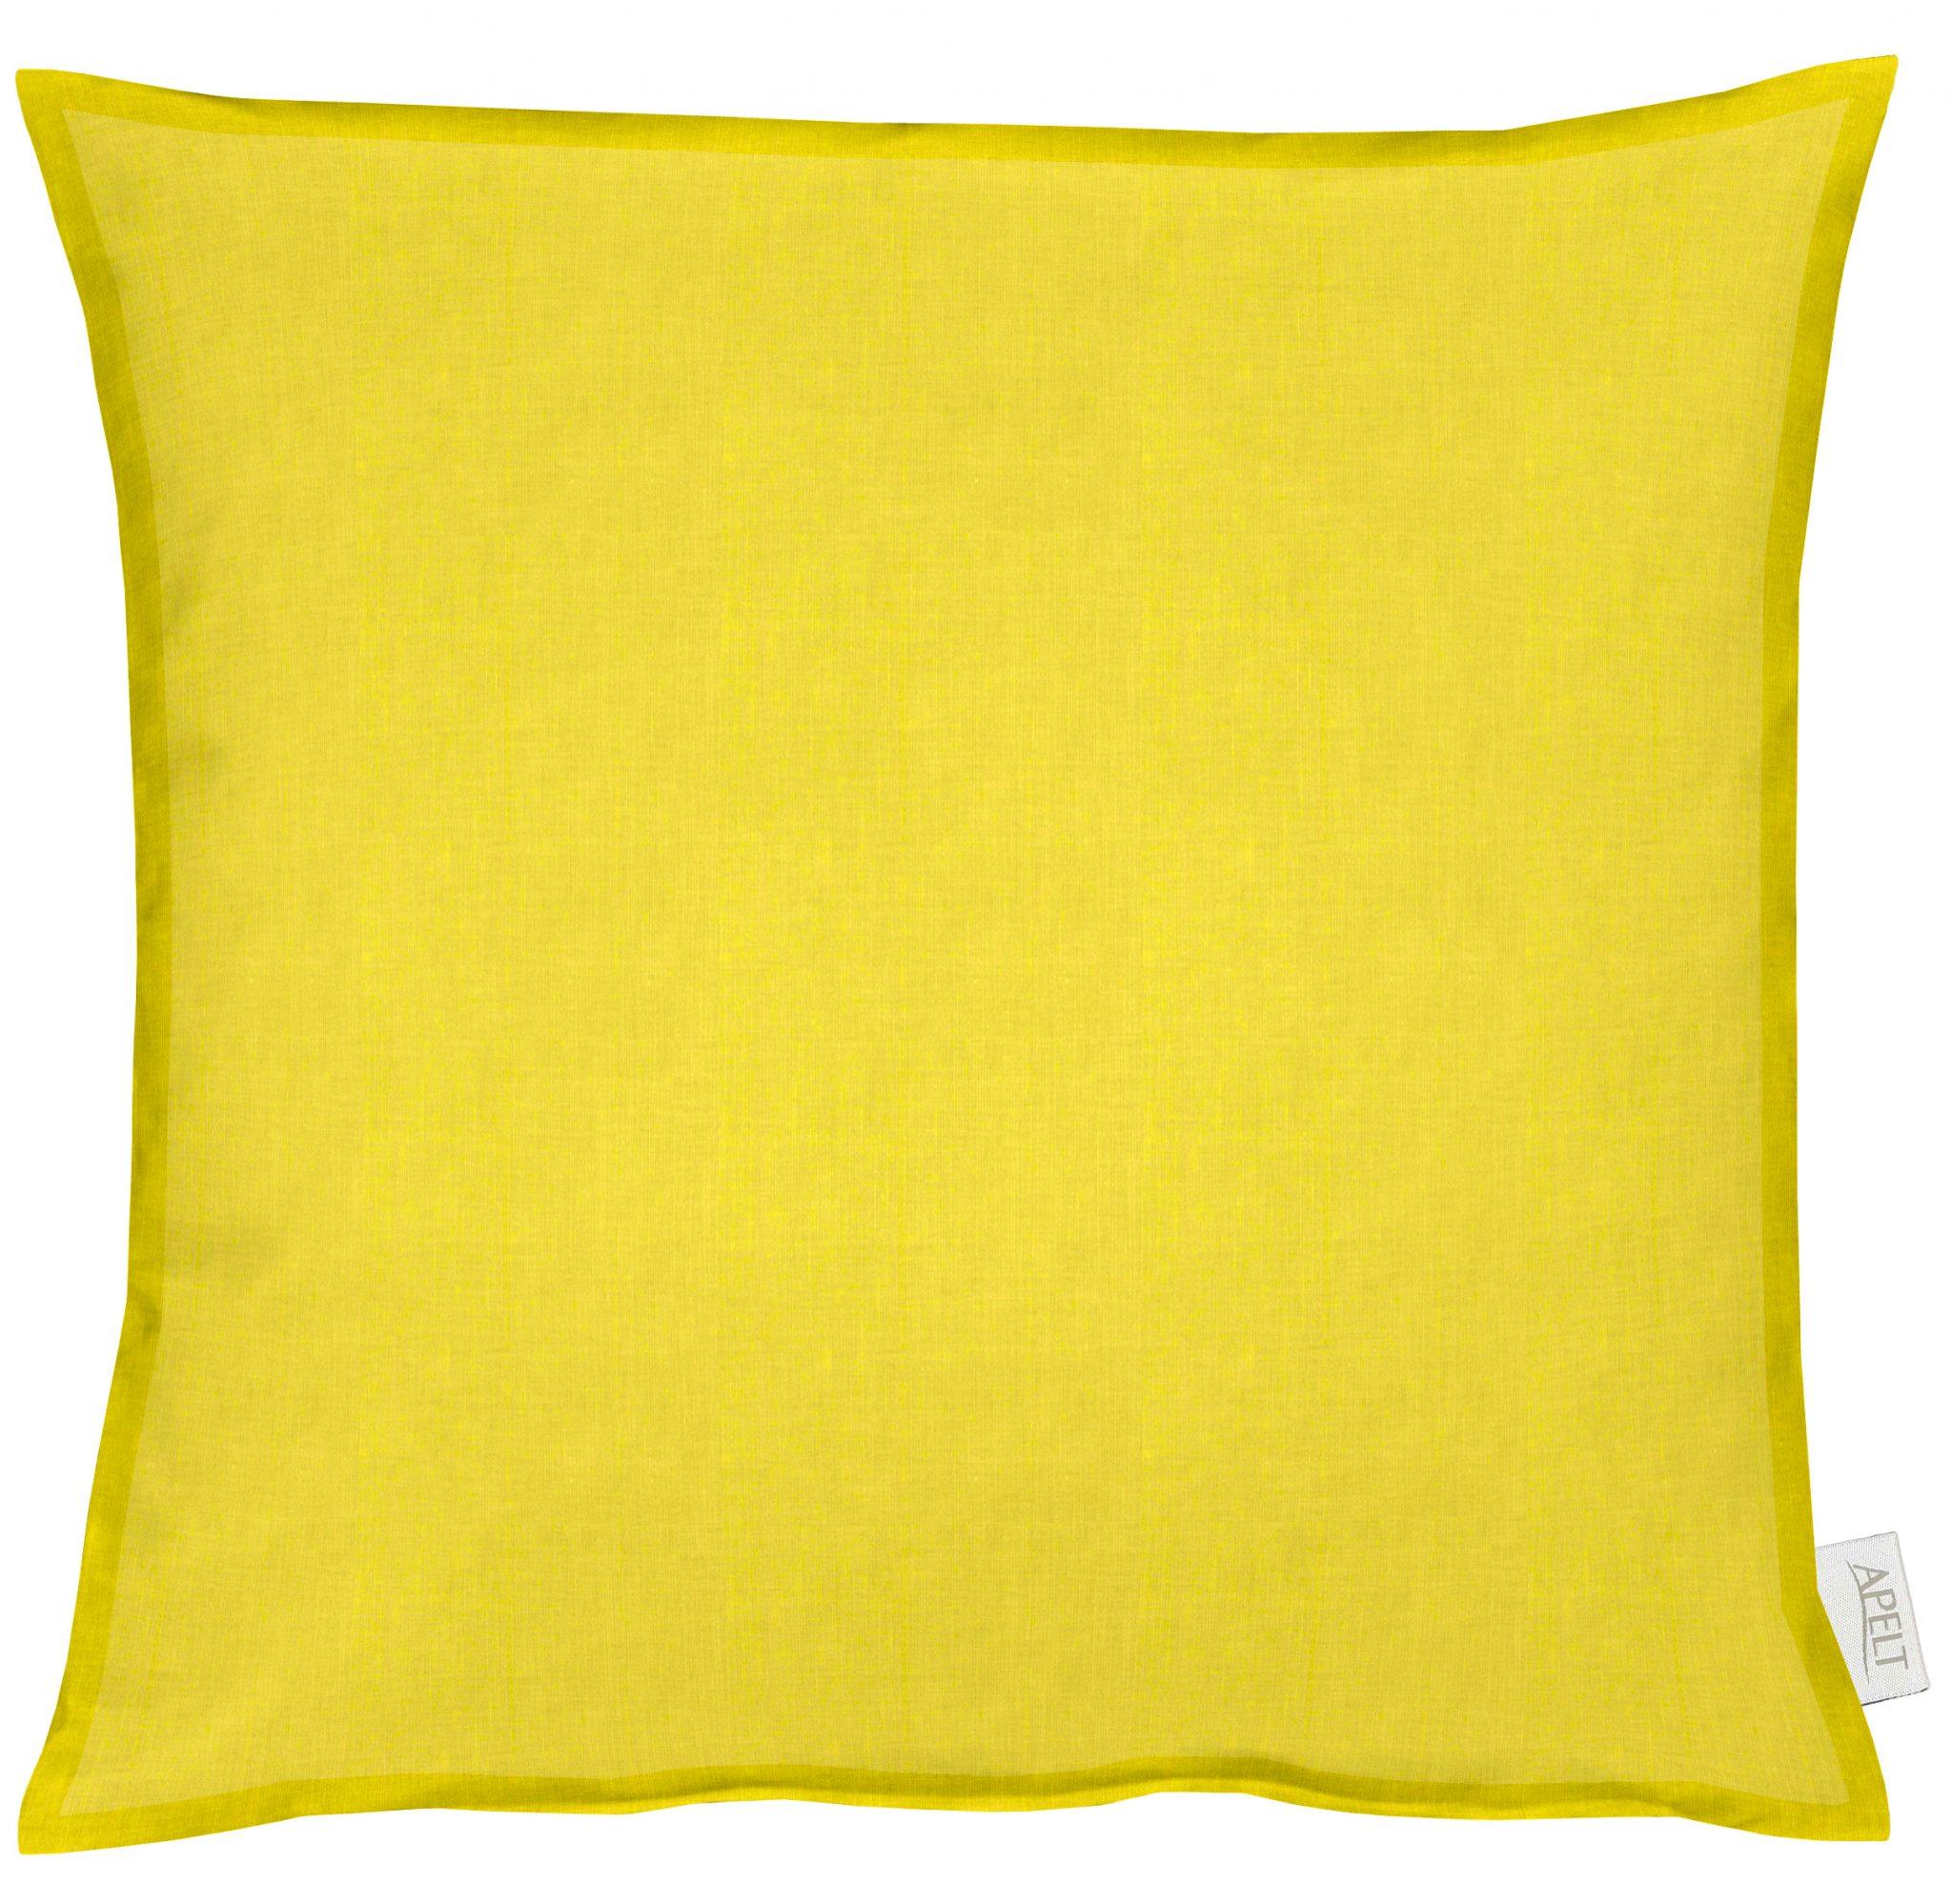 Dekokissen Apelt ALASKA gelb mit Stehsaum 50x50